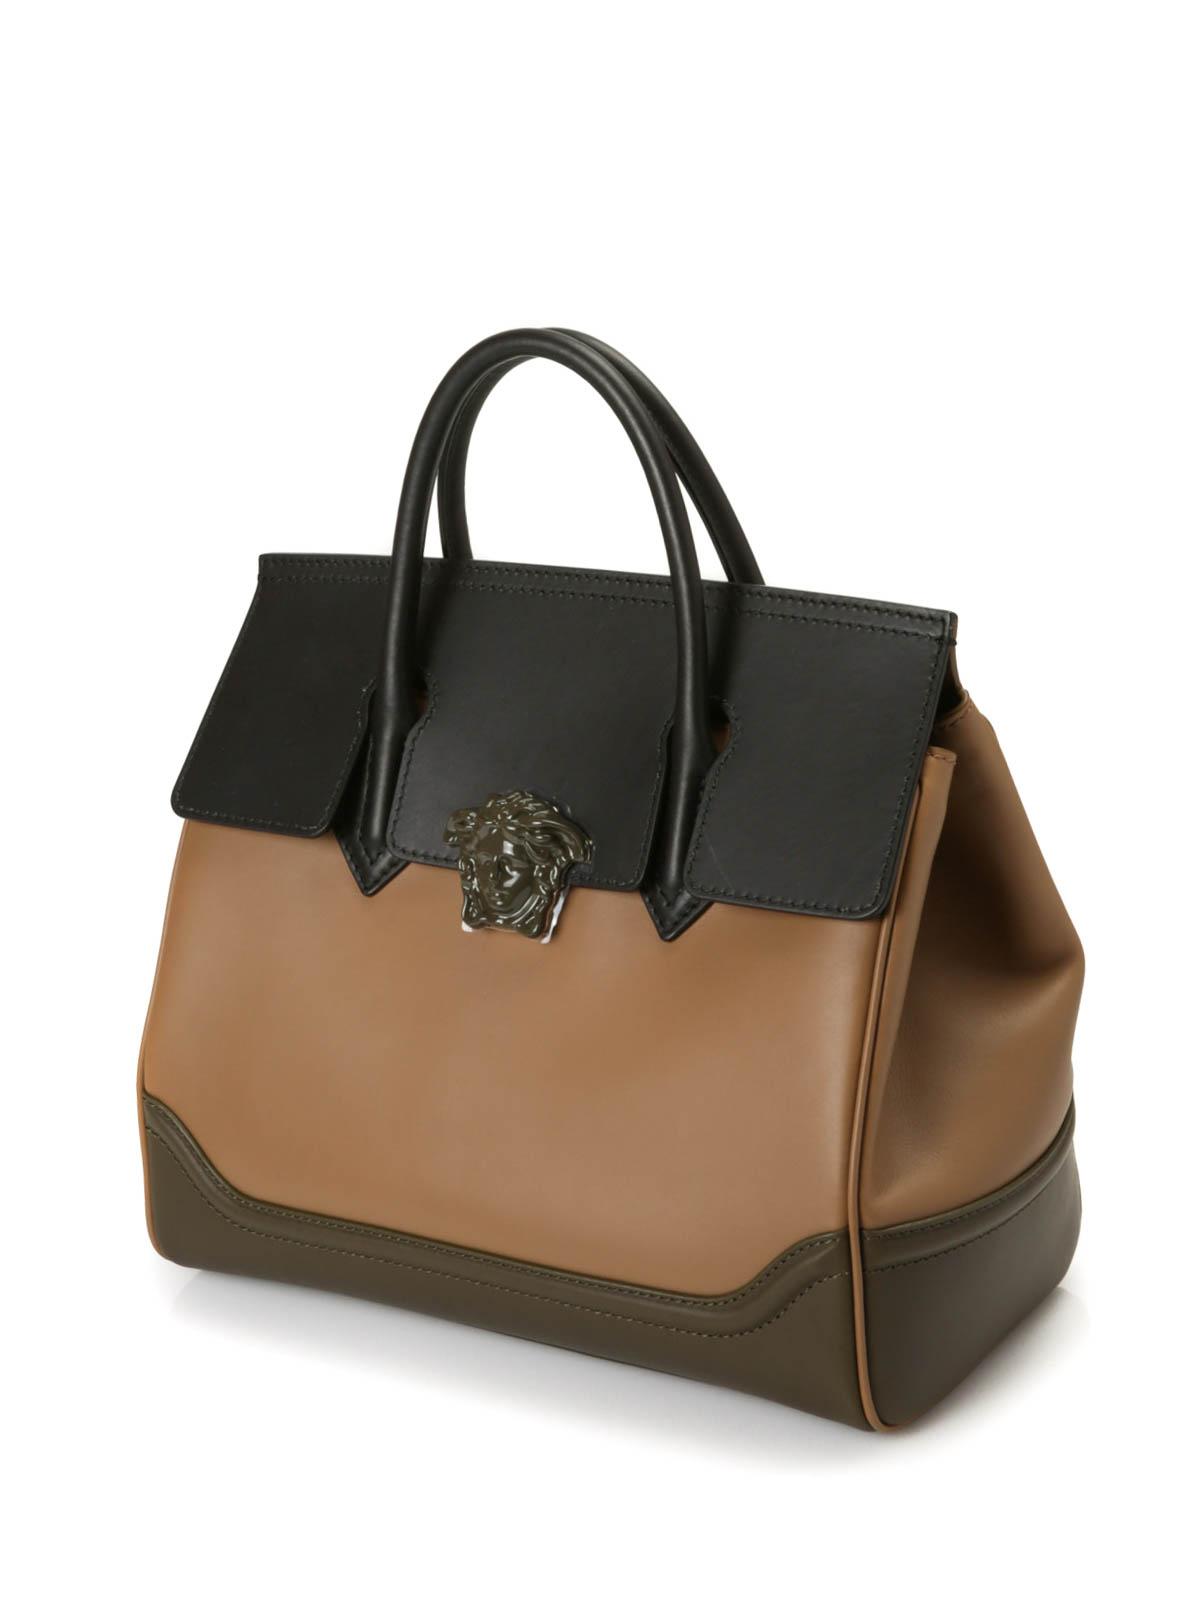 Versace - Palazzo Empire tote - totes bags - DBFF453 DSTVT KM4JO 27a84c8447a90